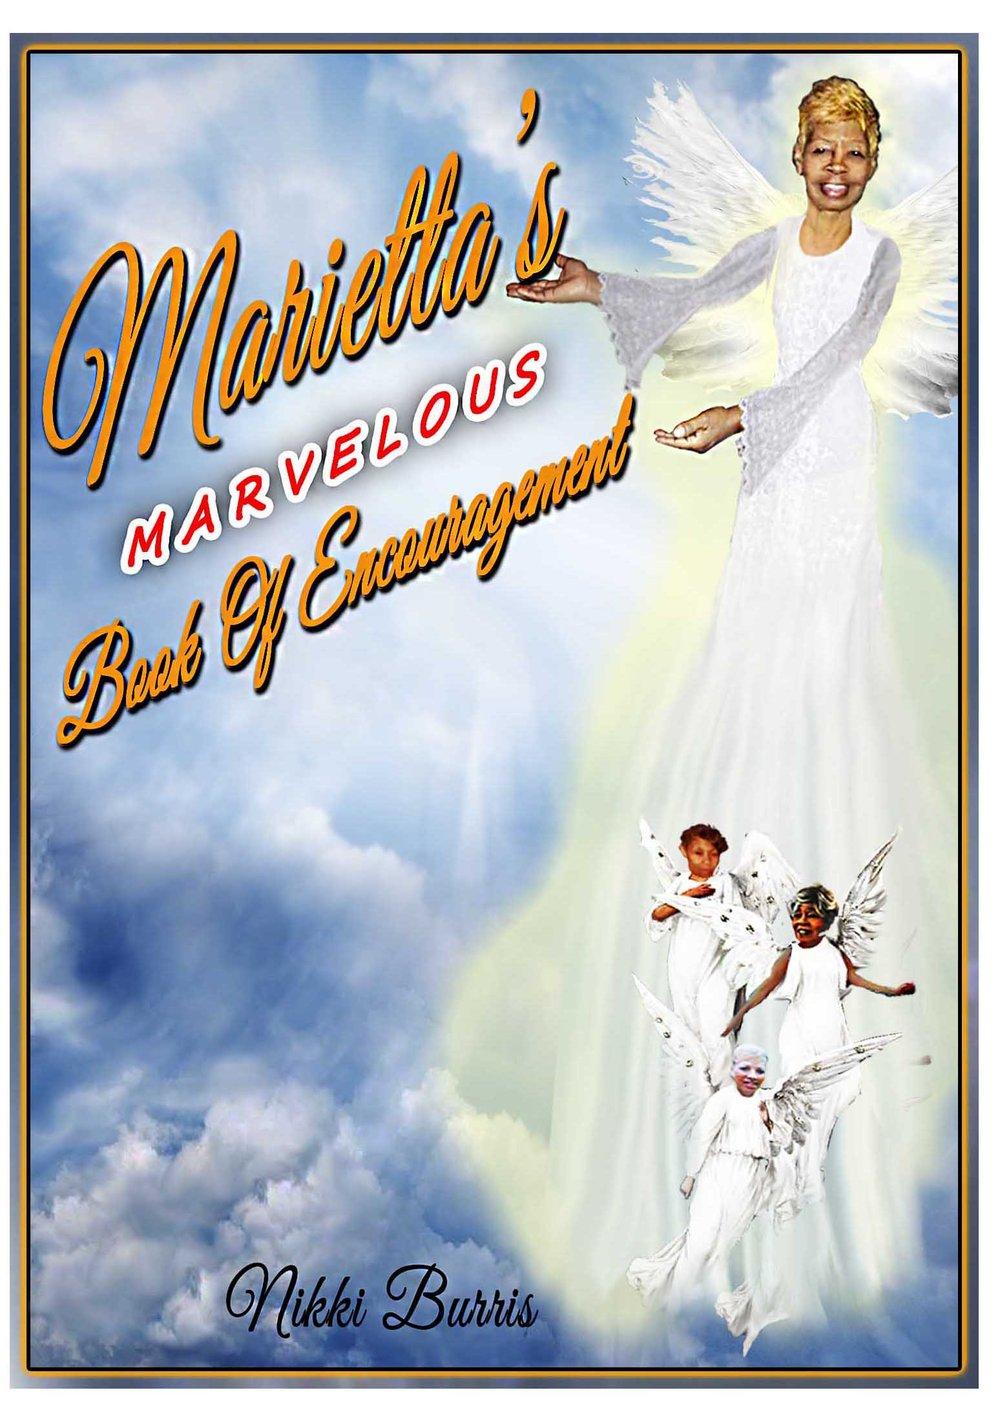 Image of Marietta's Marvelous Book of Encouragement